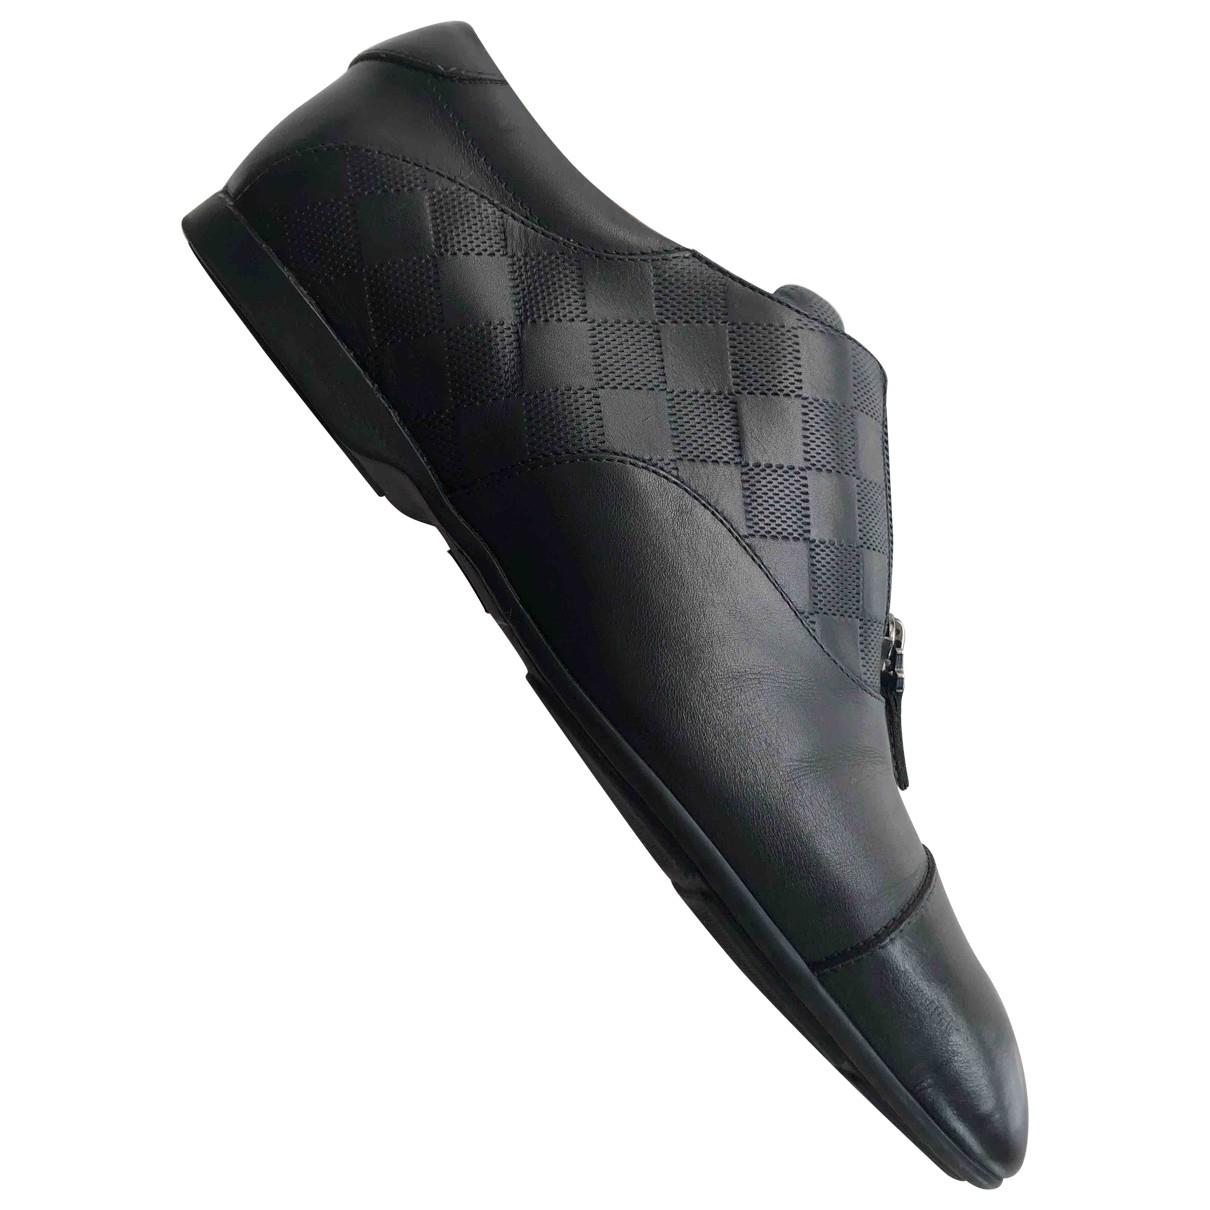 Louis Vuitton \N Black Leather Lace ups for Men 5 UK